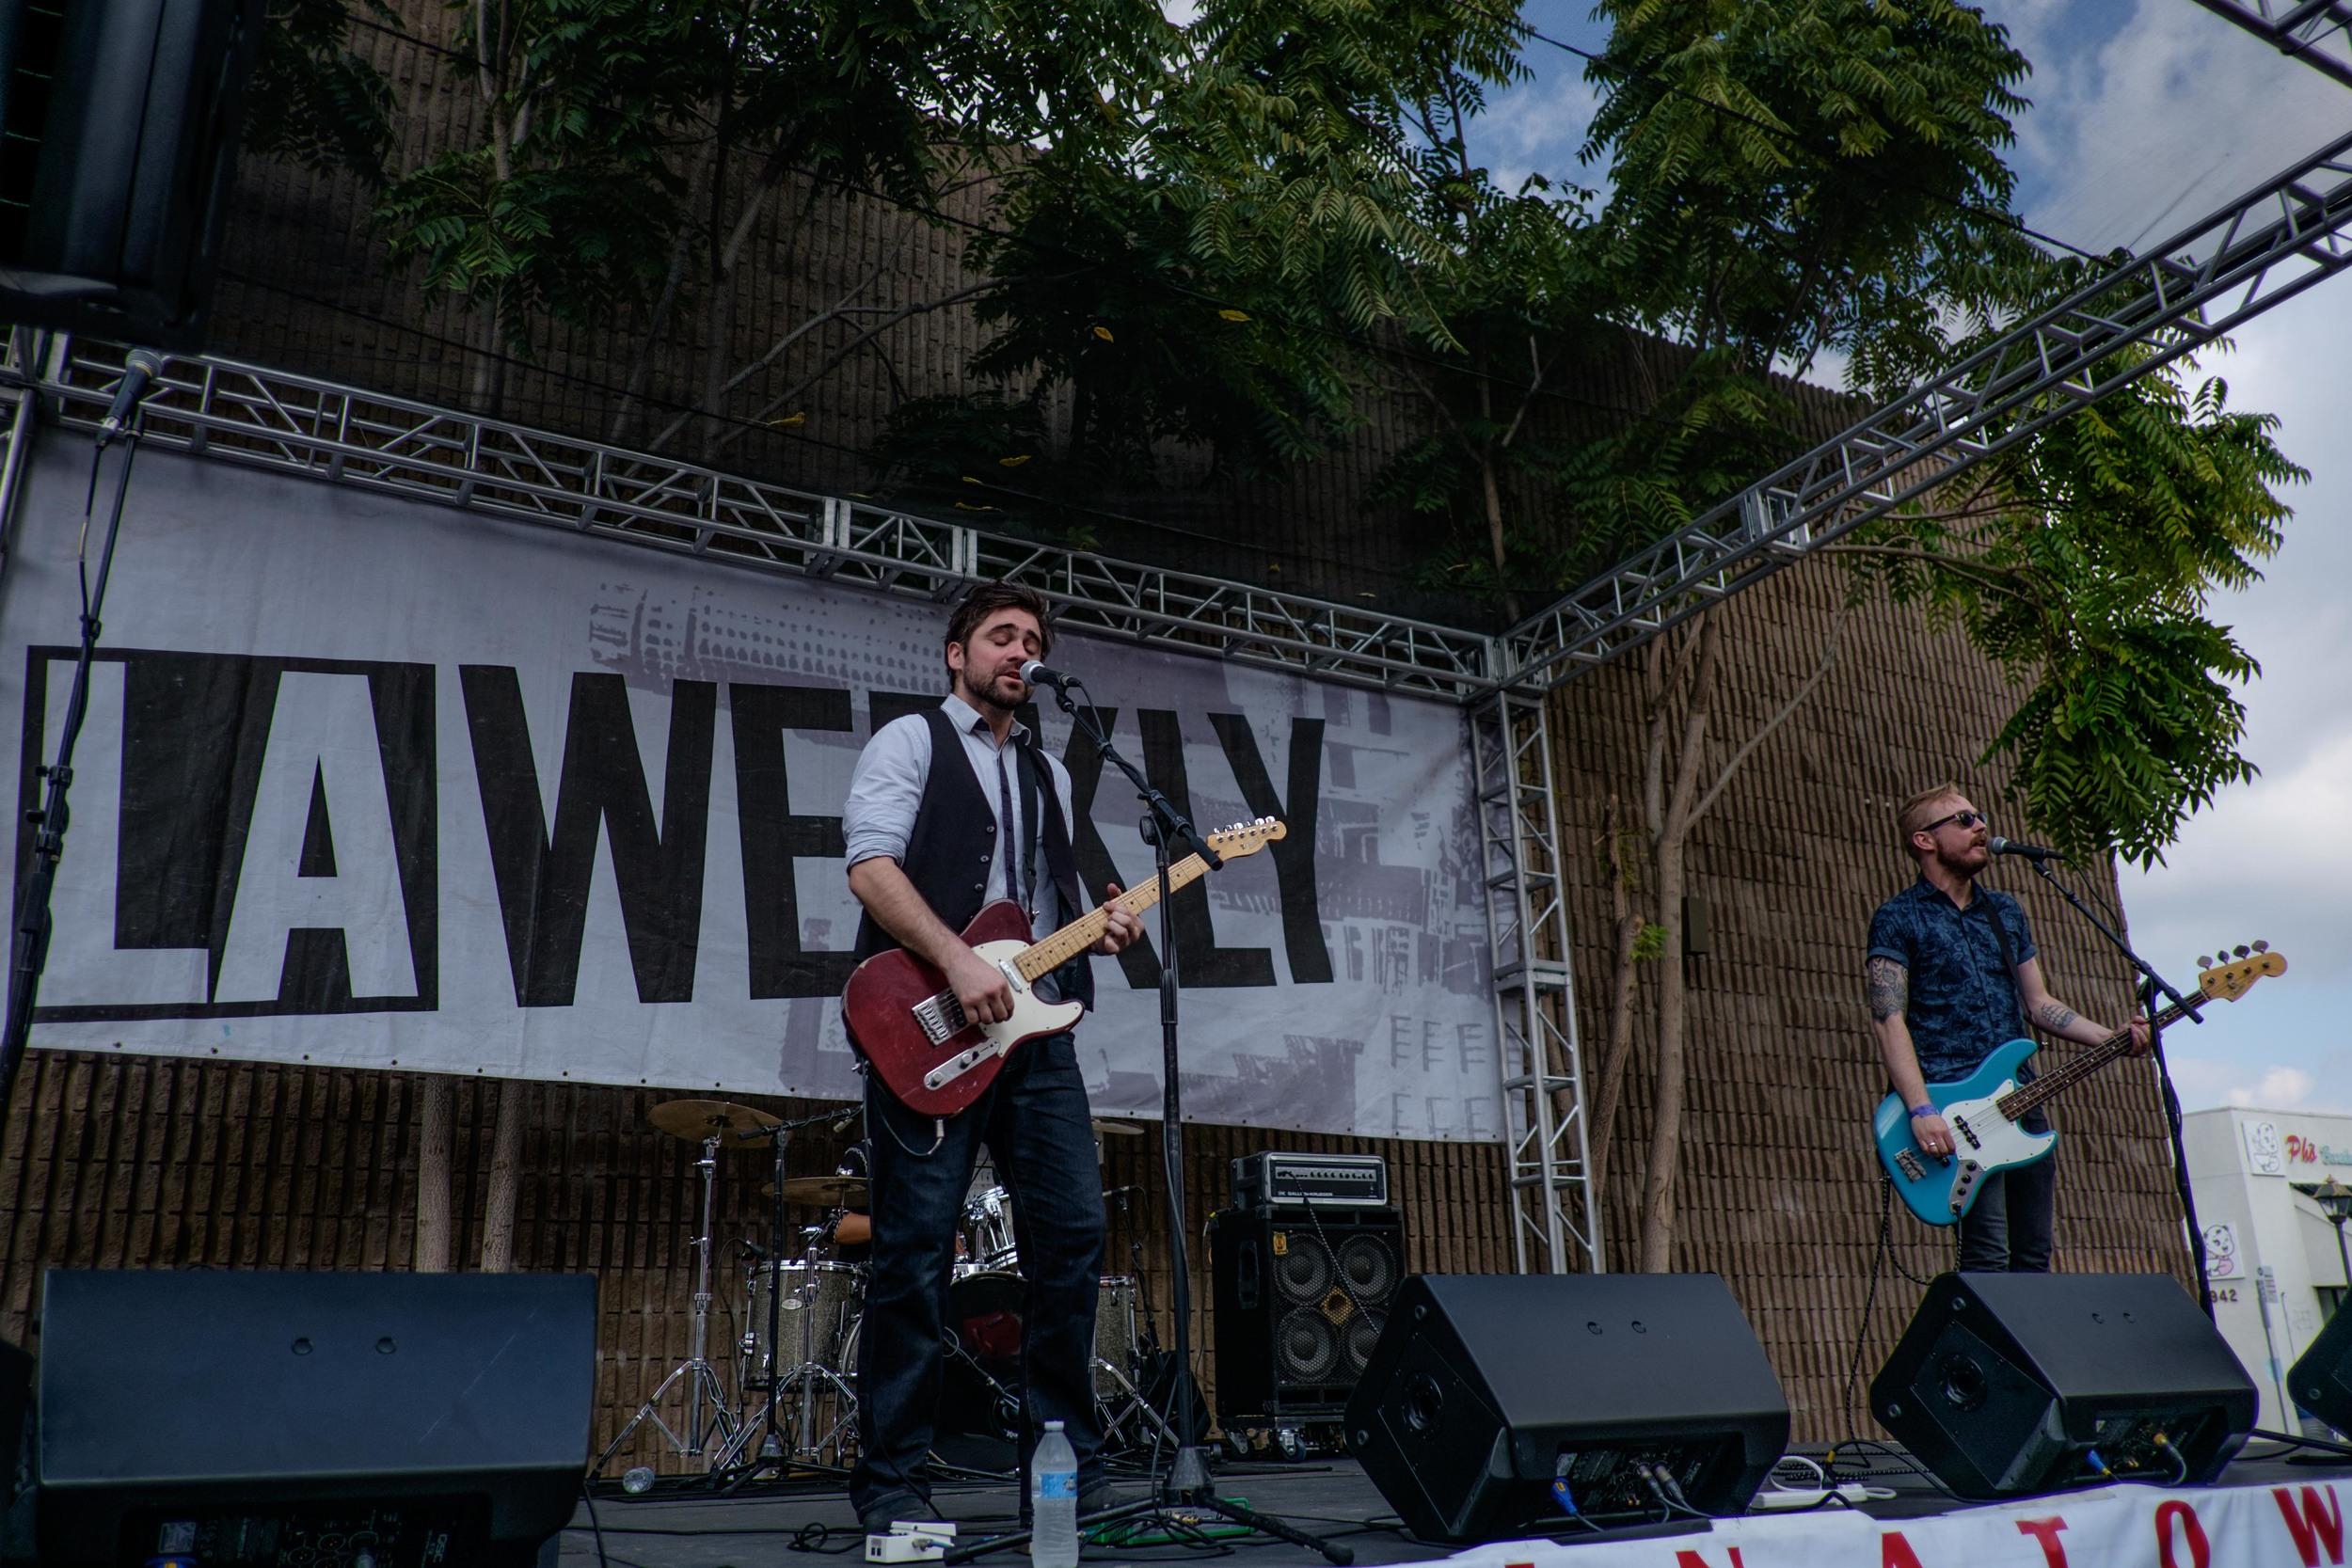 Weekend Entertainment